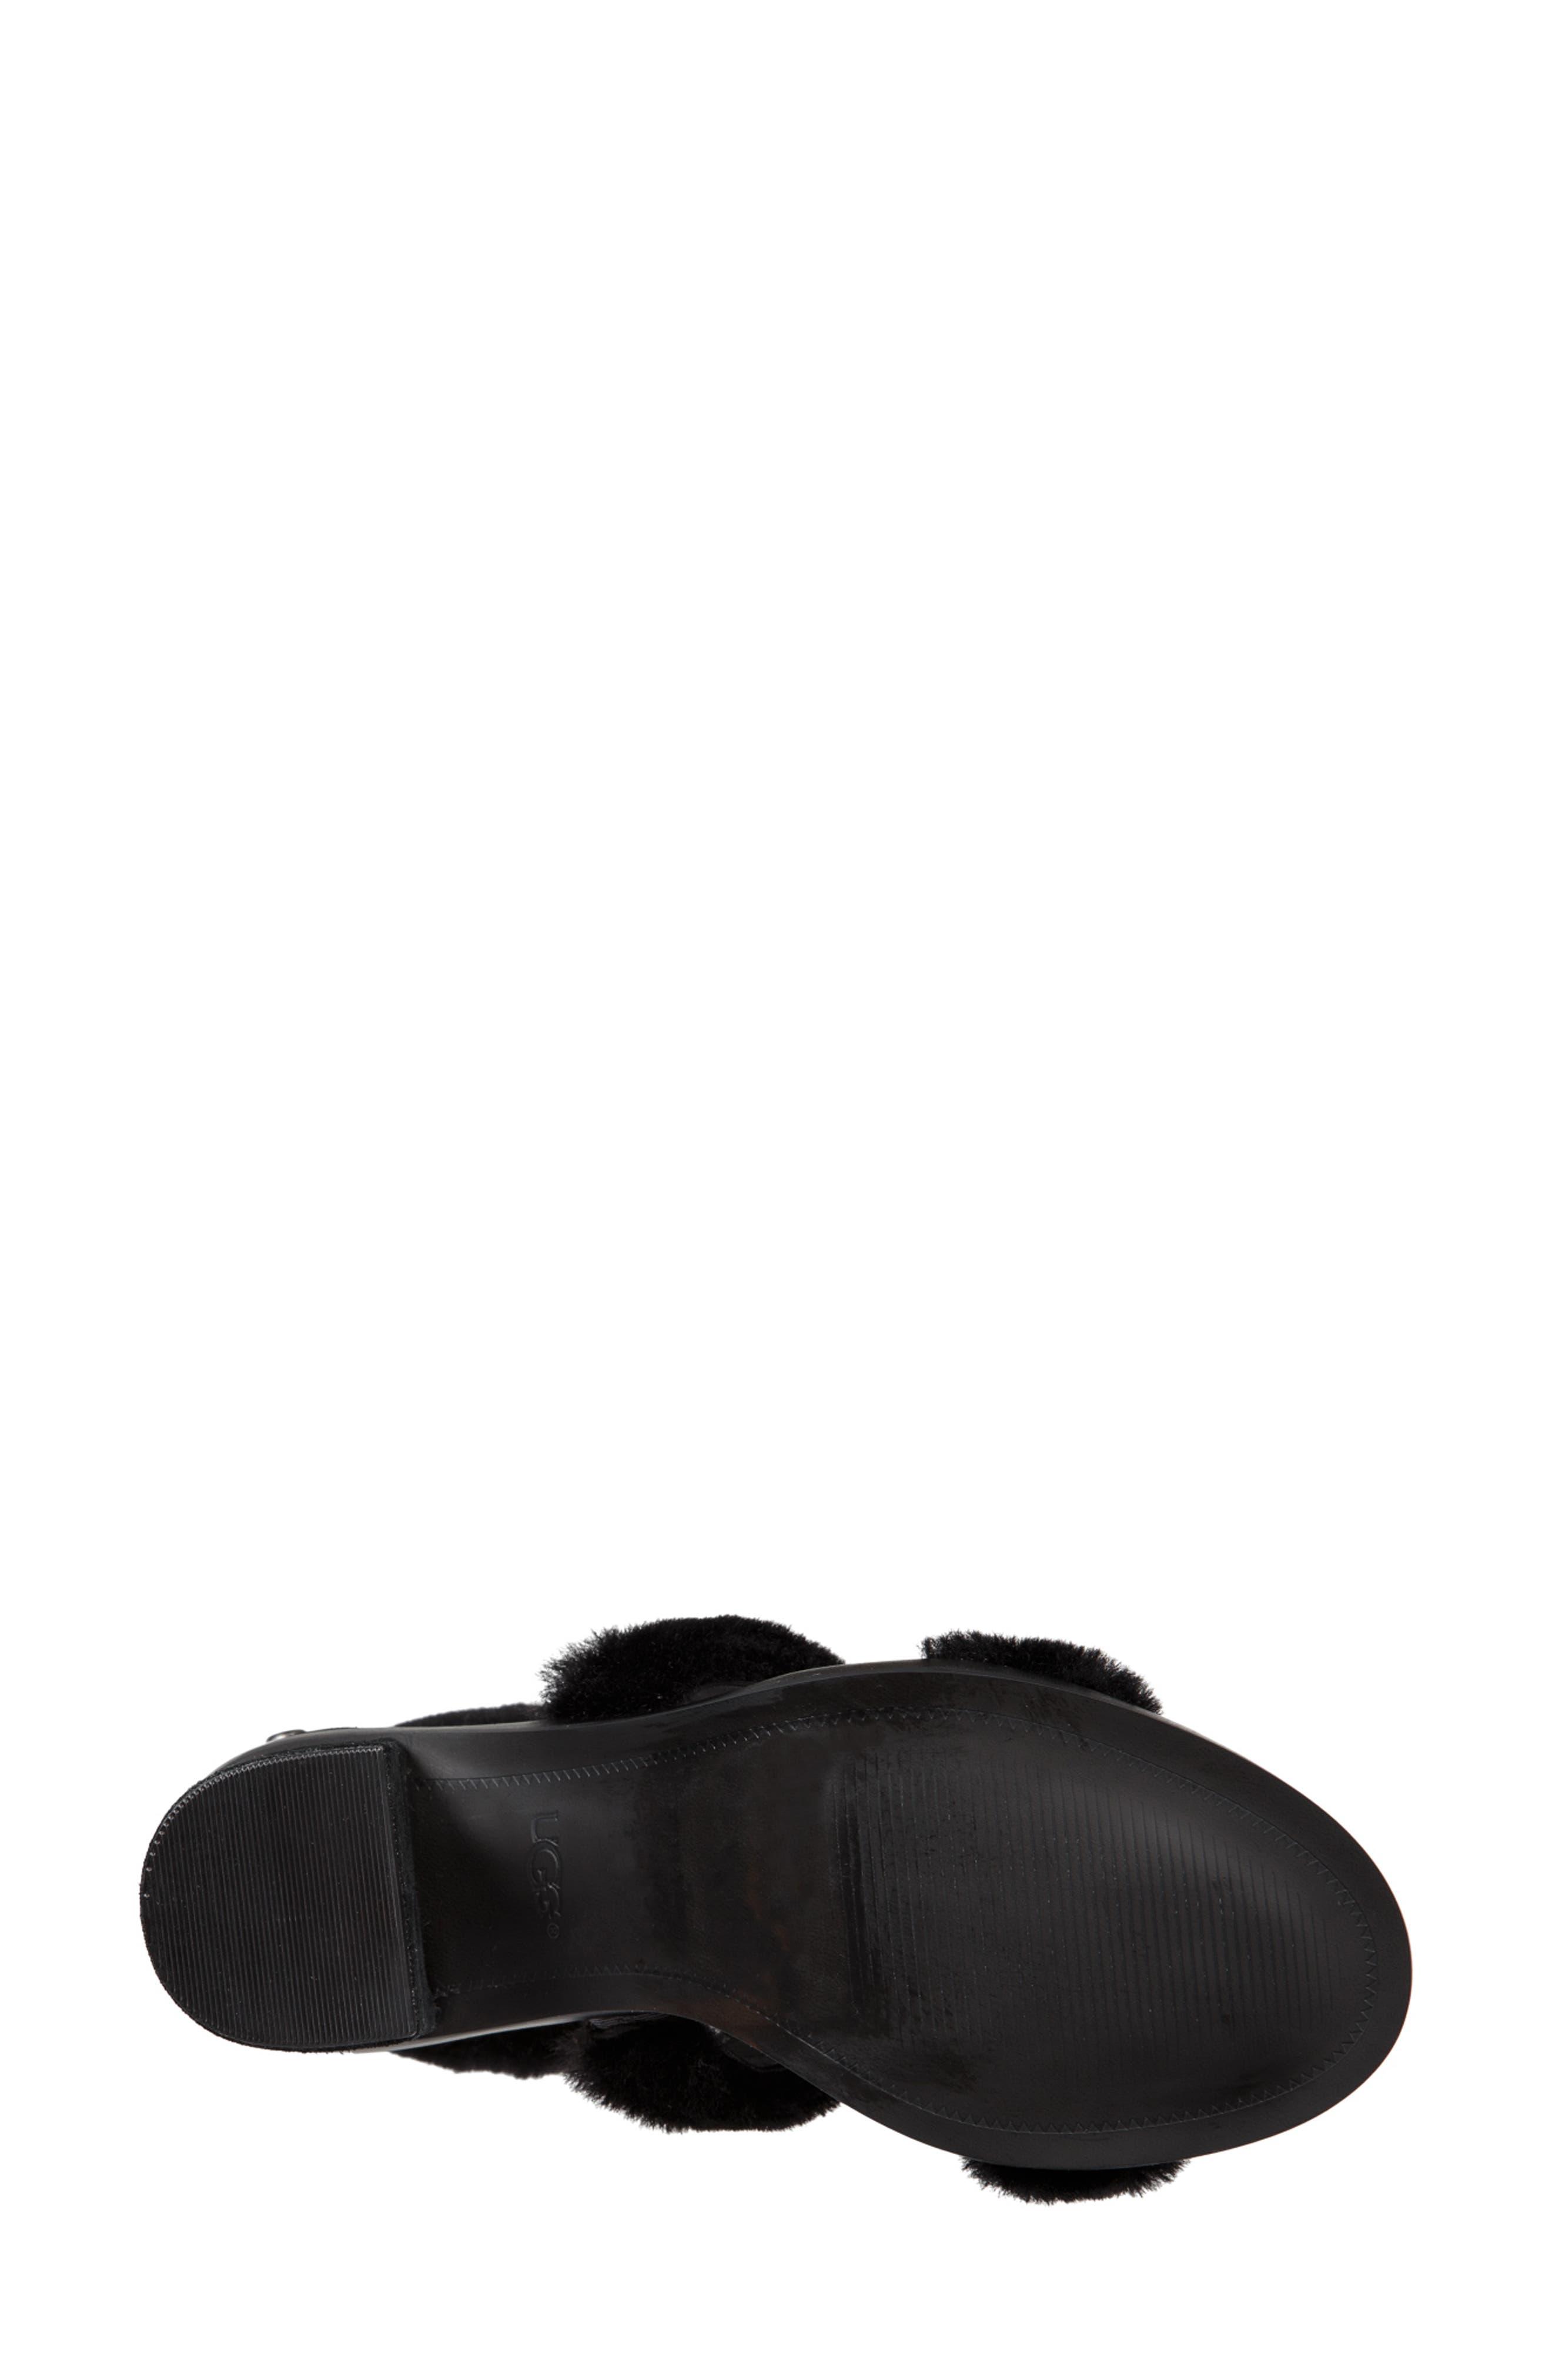 Dey Rey Genuine Shearling Sandal,                             Alternate thumbnail 5, color,                             001